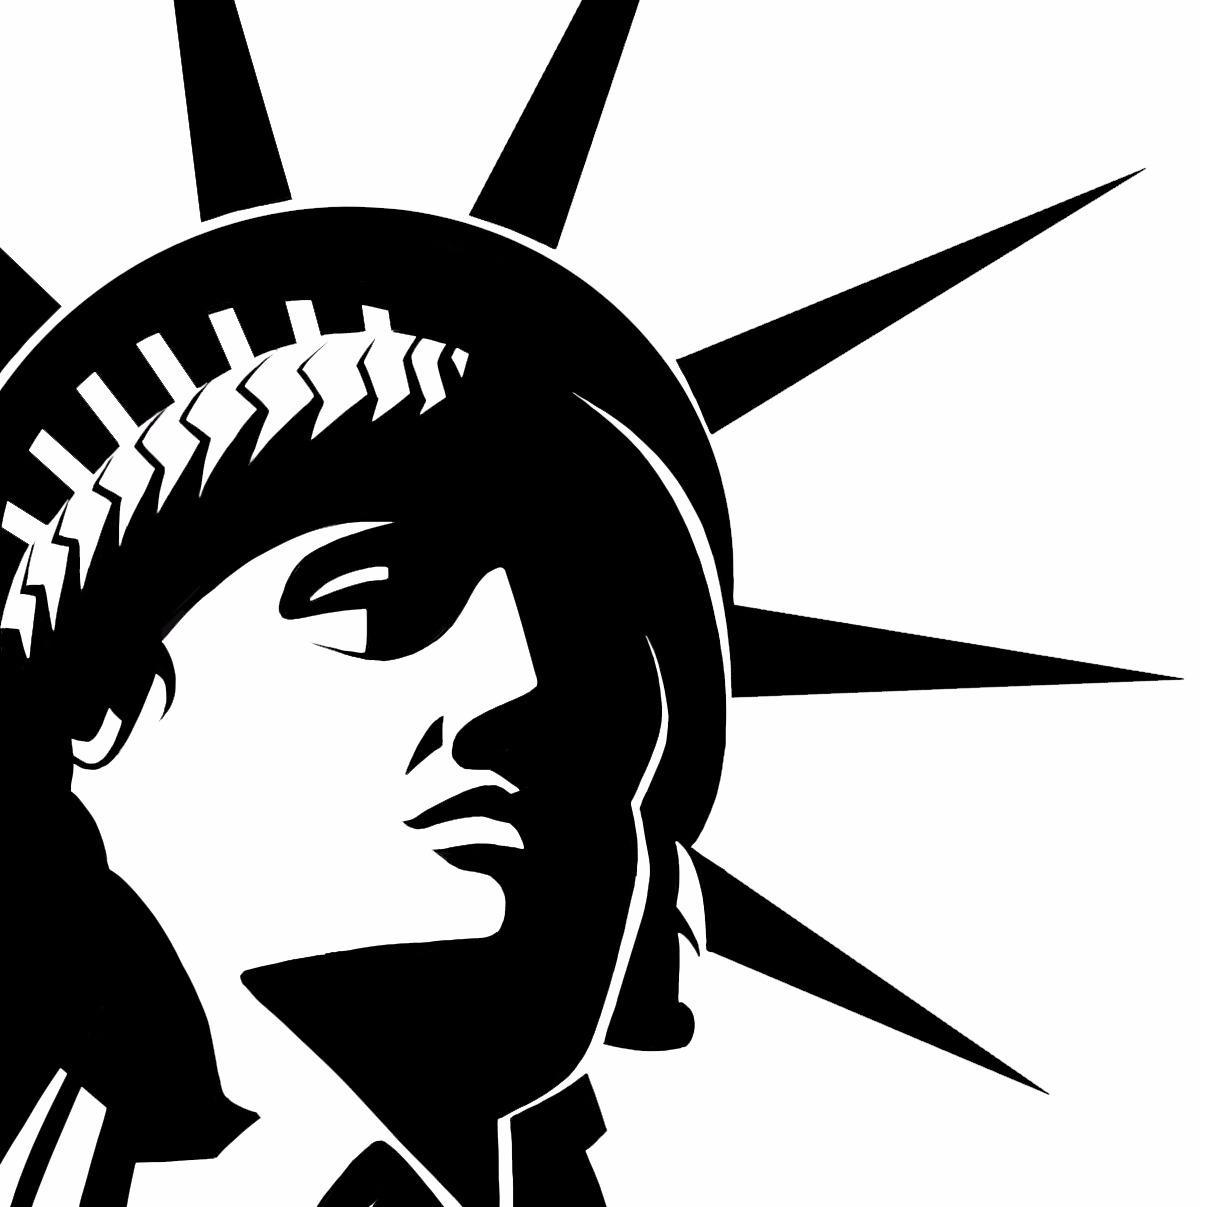 Liberty Capital Group